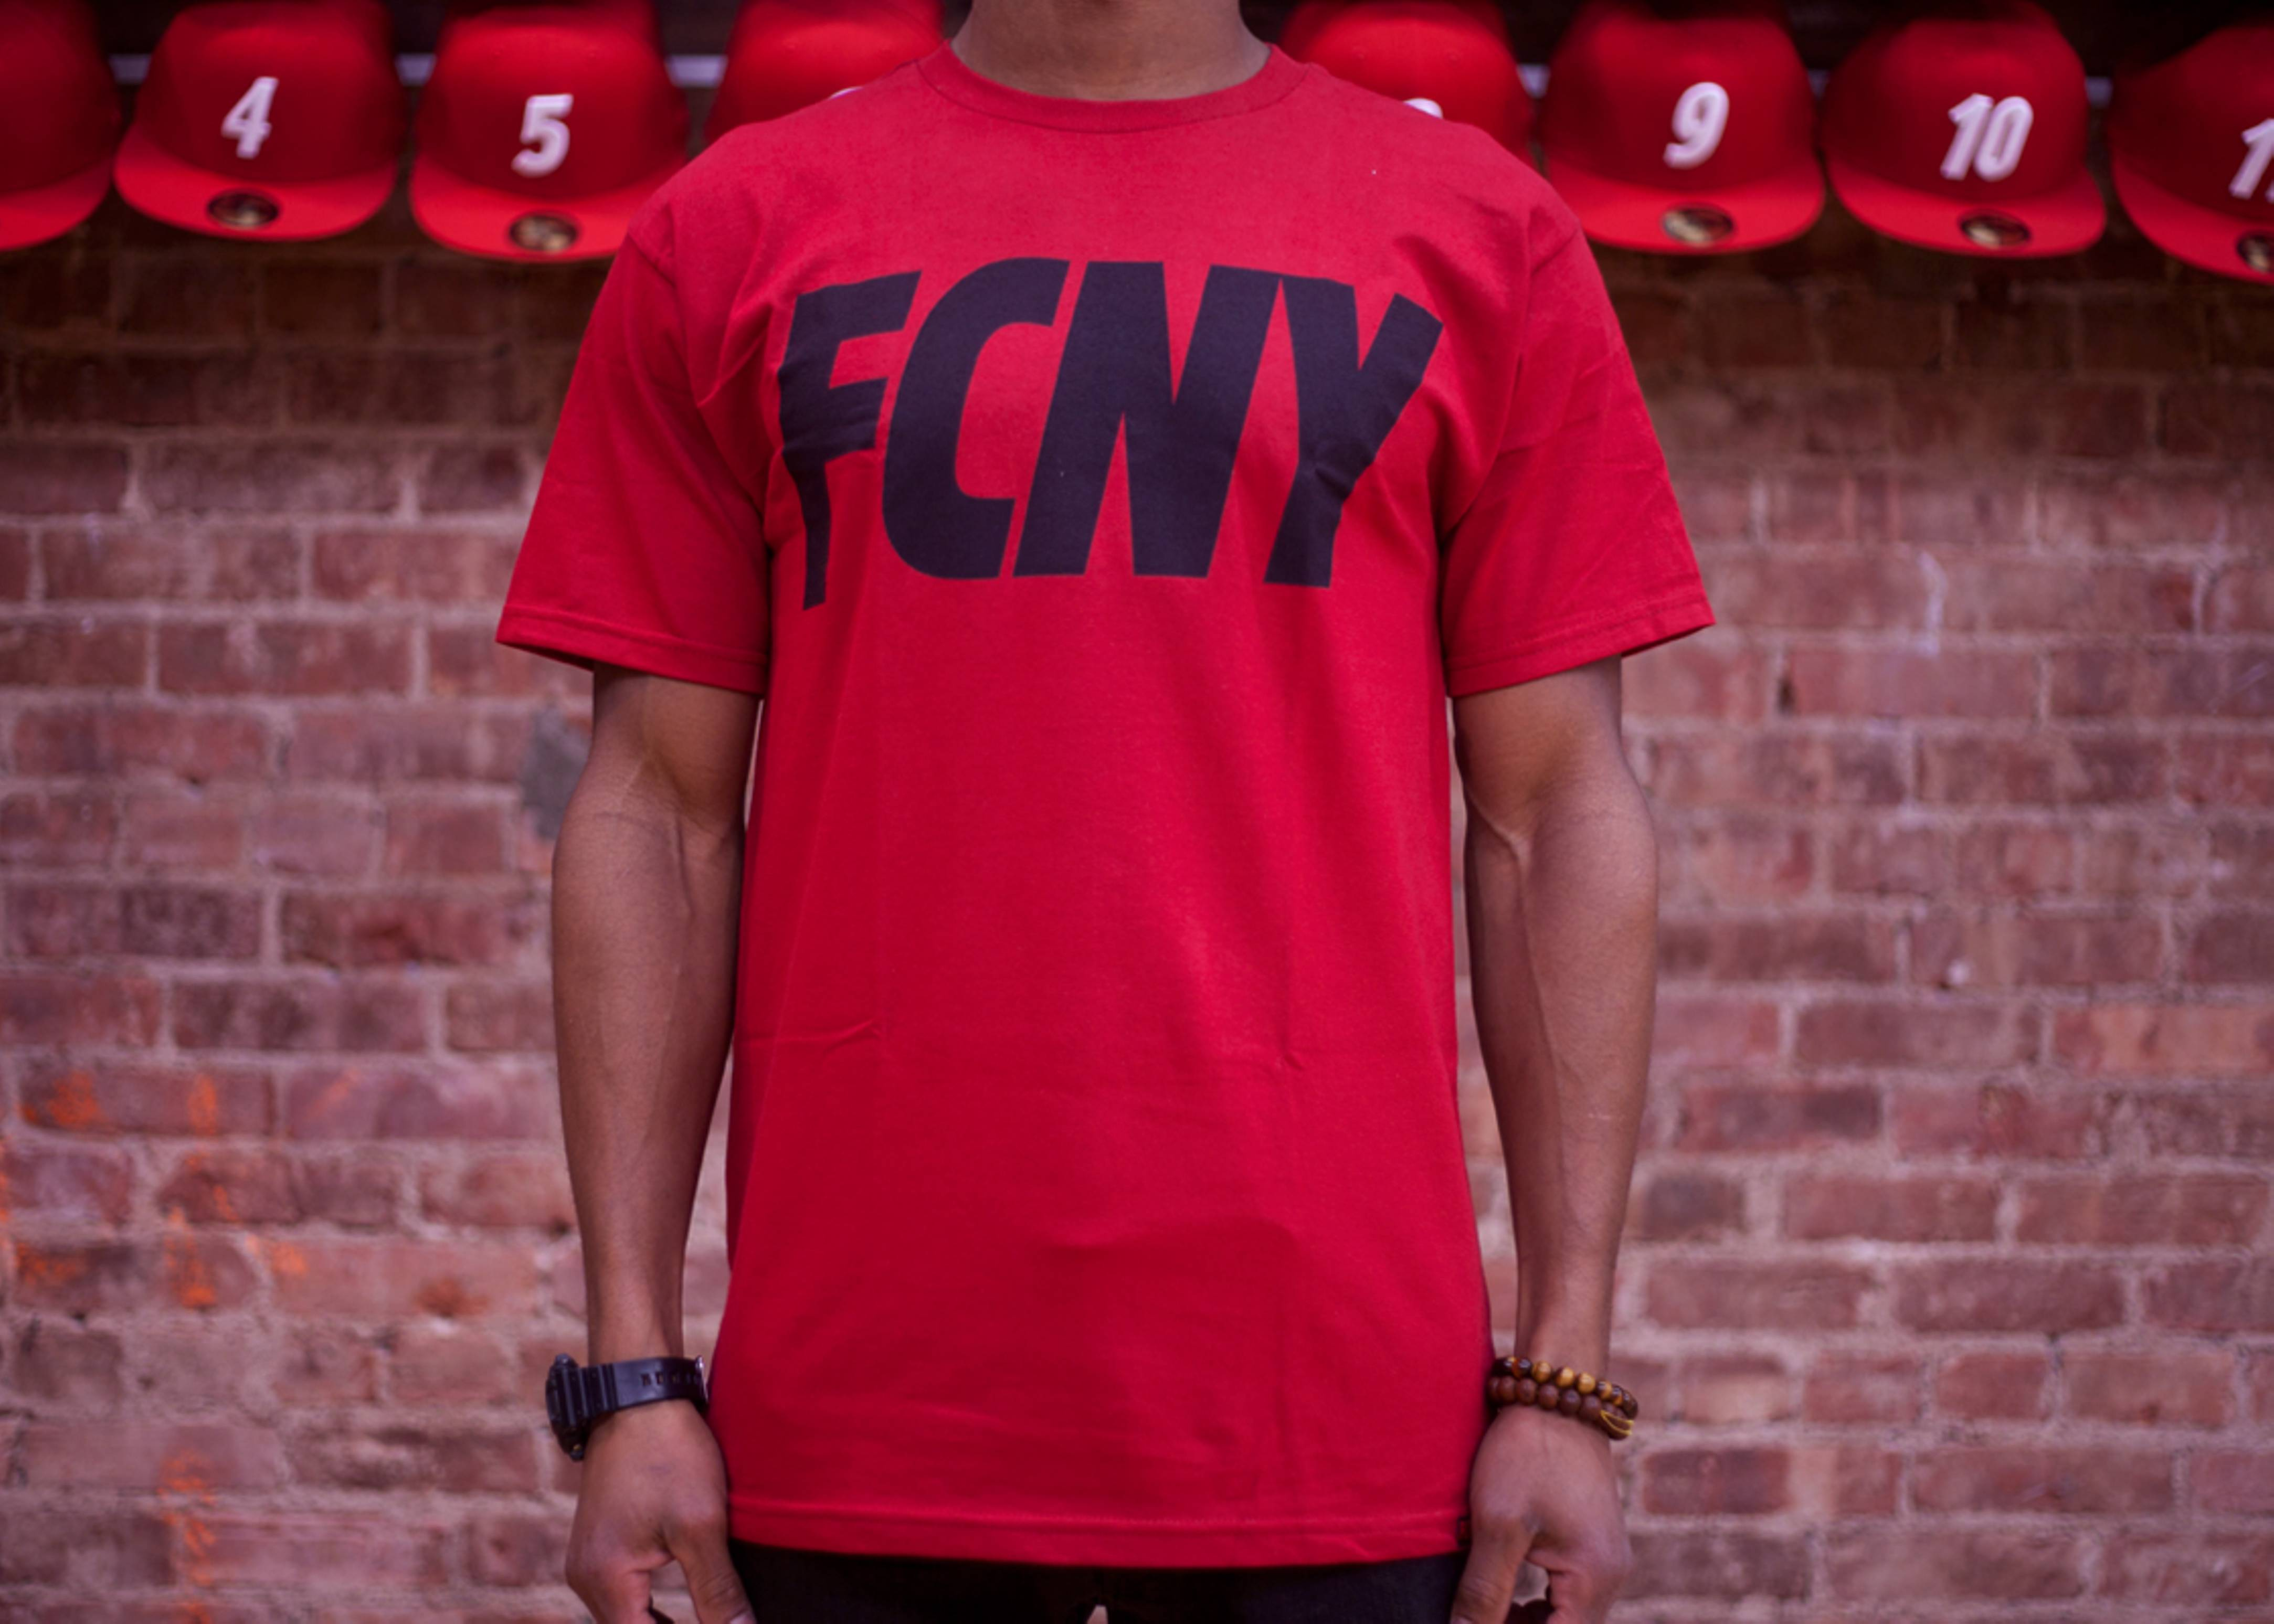 fcny slant short sleeve t-shirt